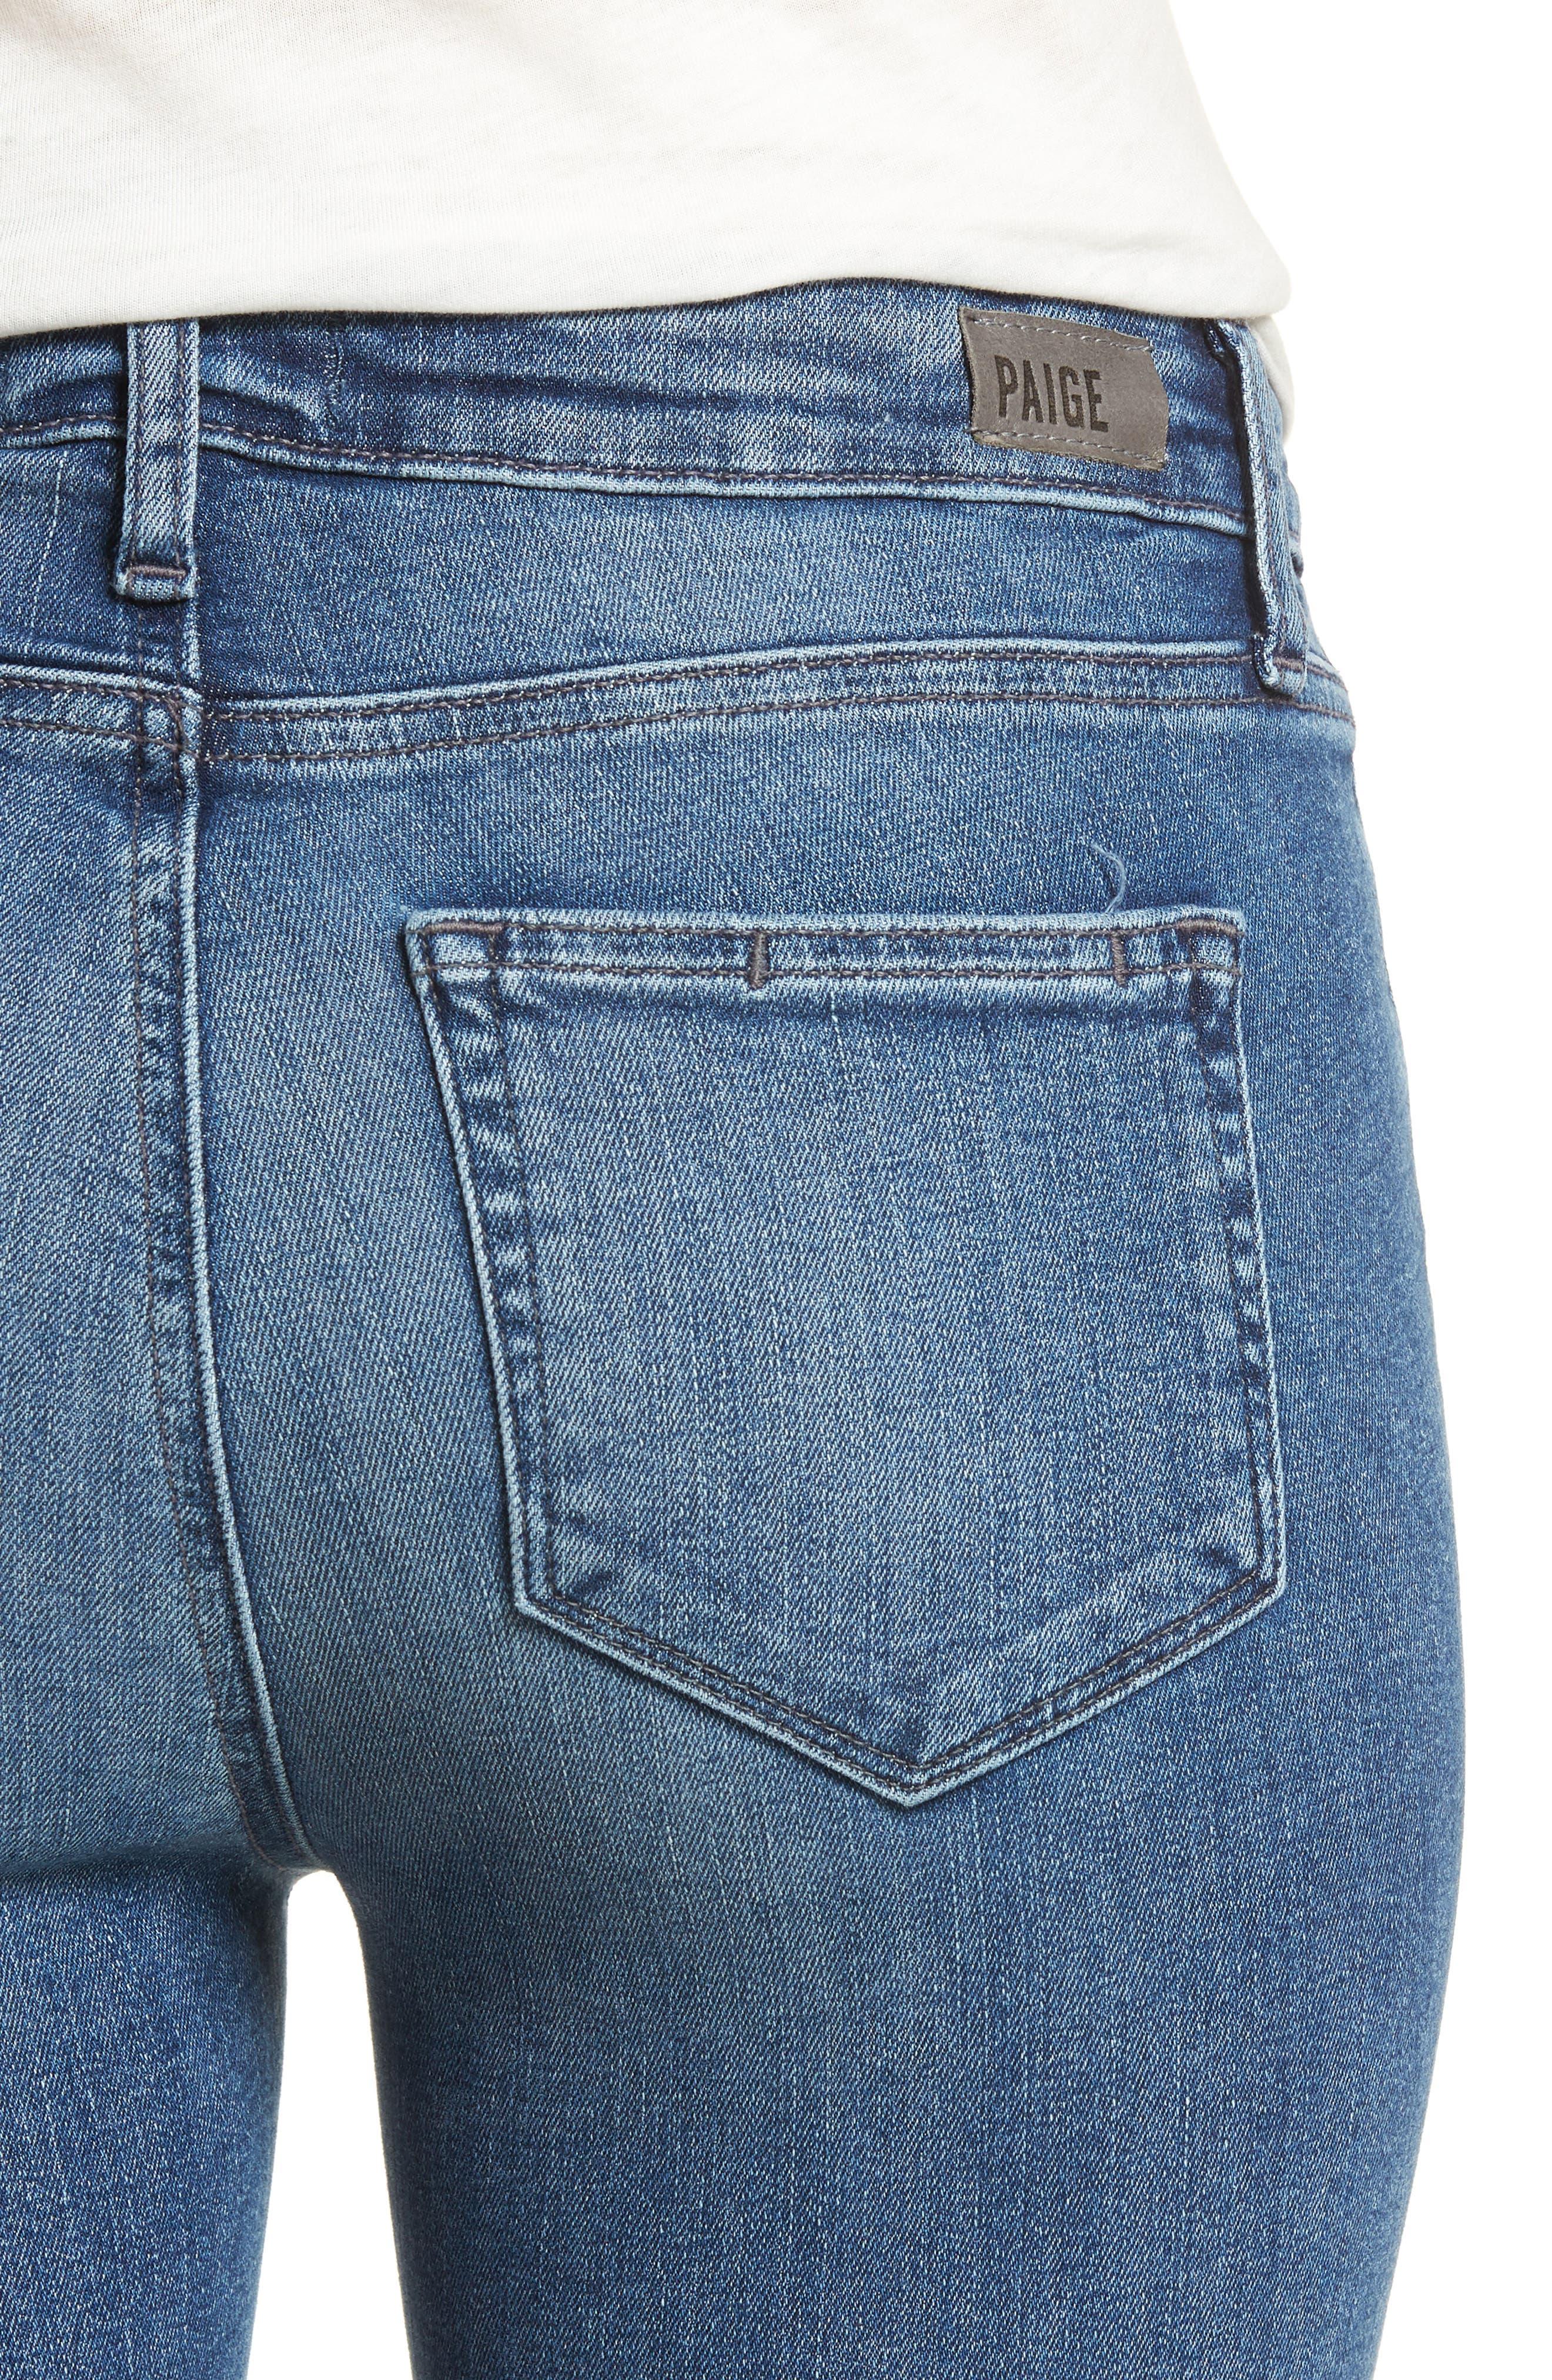 Transcend Vintage - Verdugo Crop Ultra Skinny Jeans,                             Alternate thumbnail 4, color,                             Bloomfield